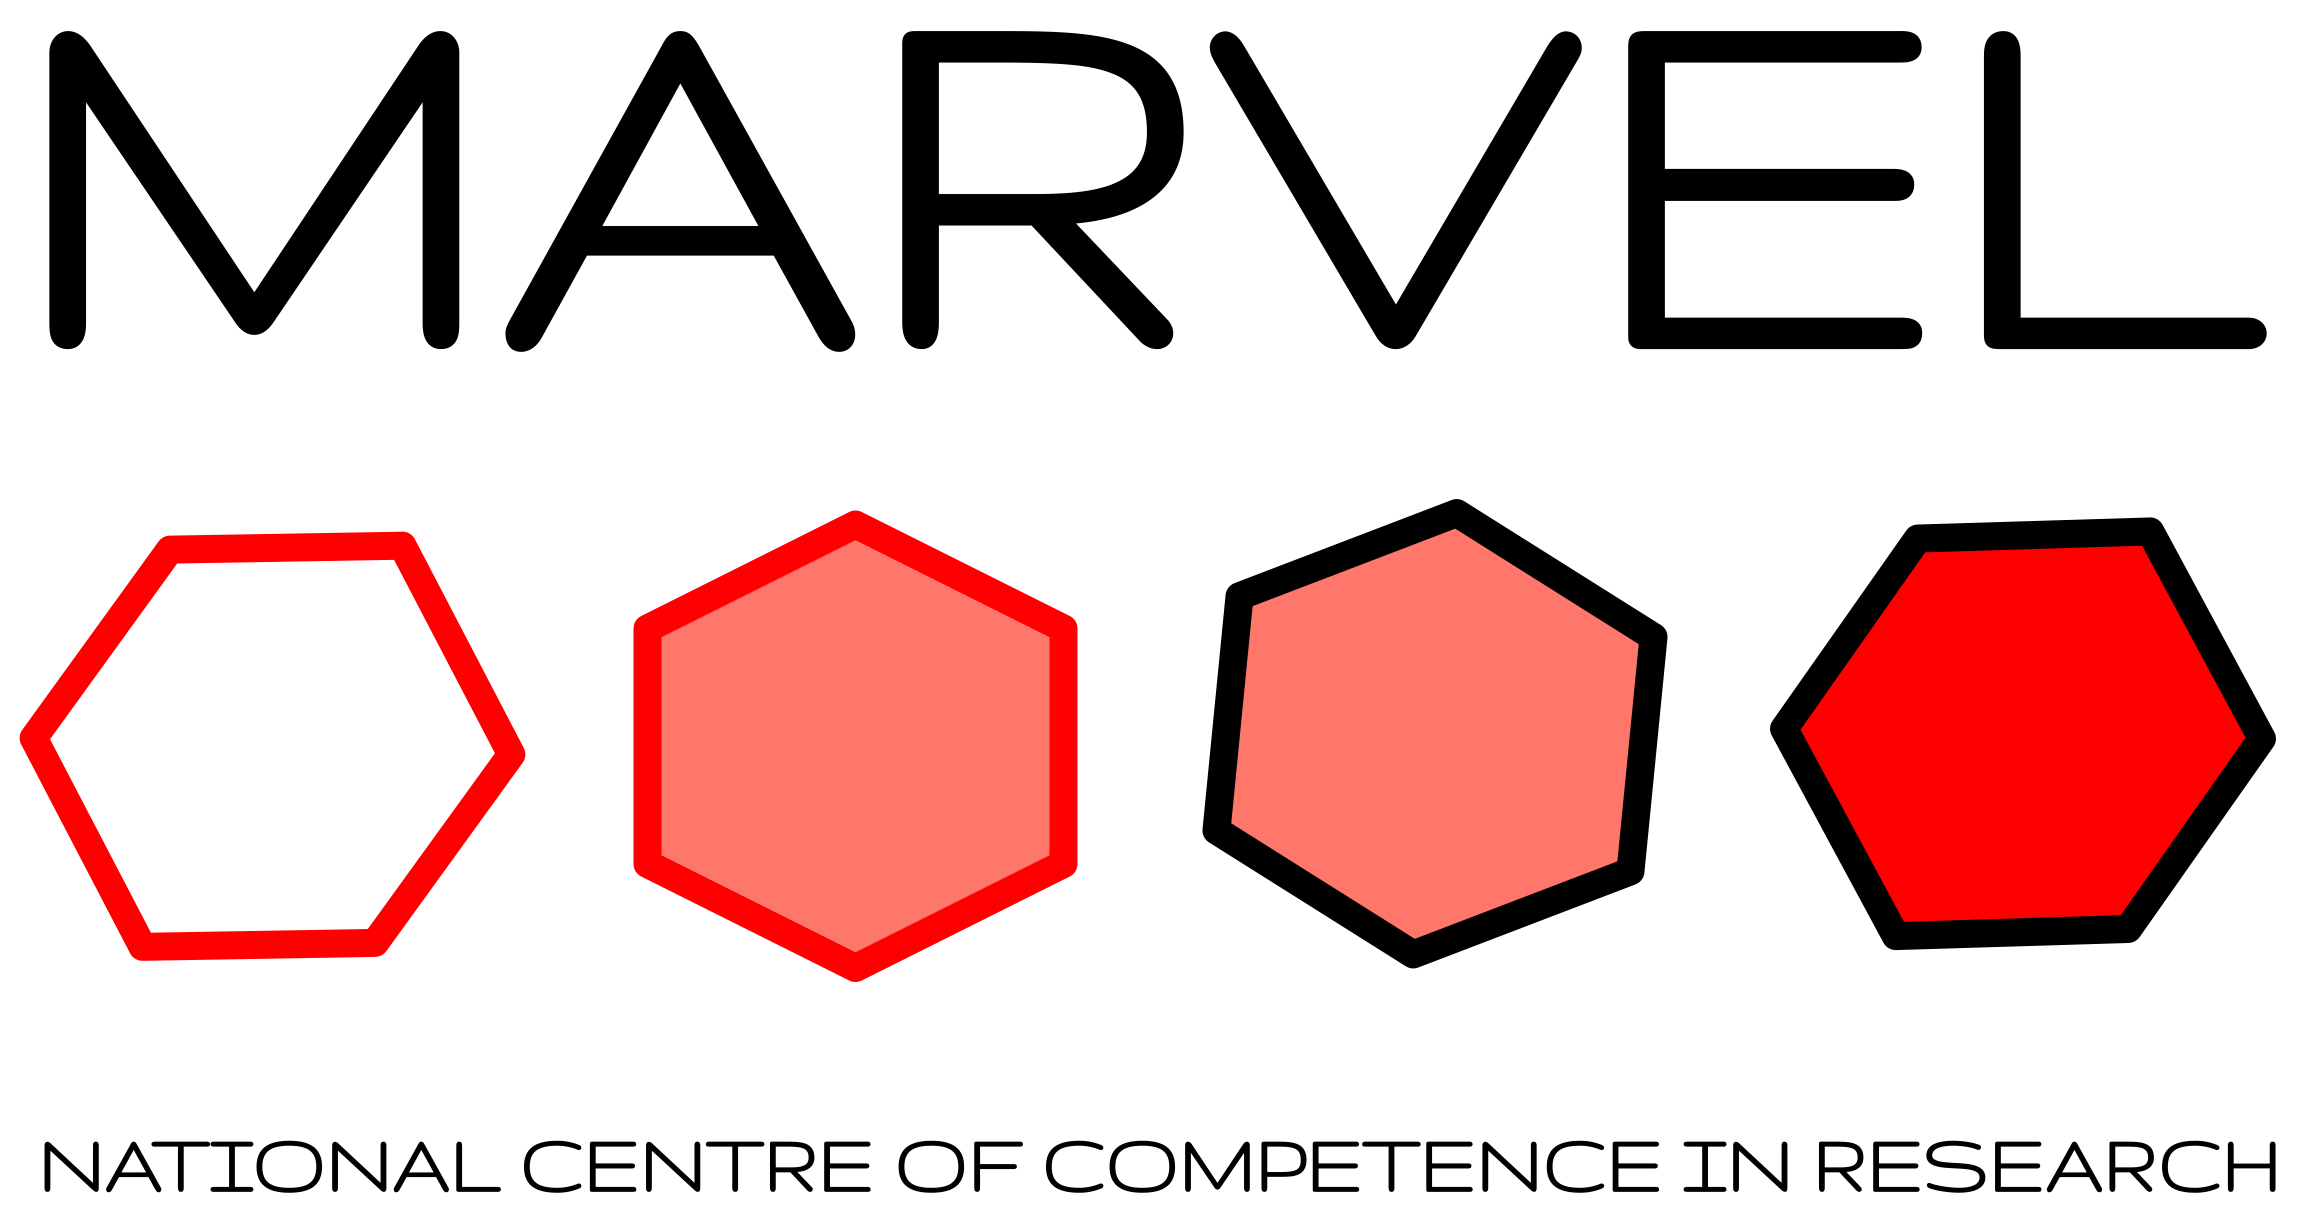 NCCR MARVEL